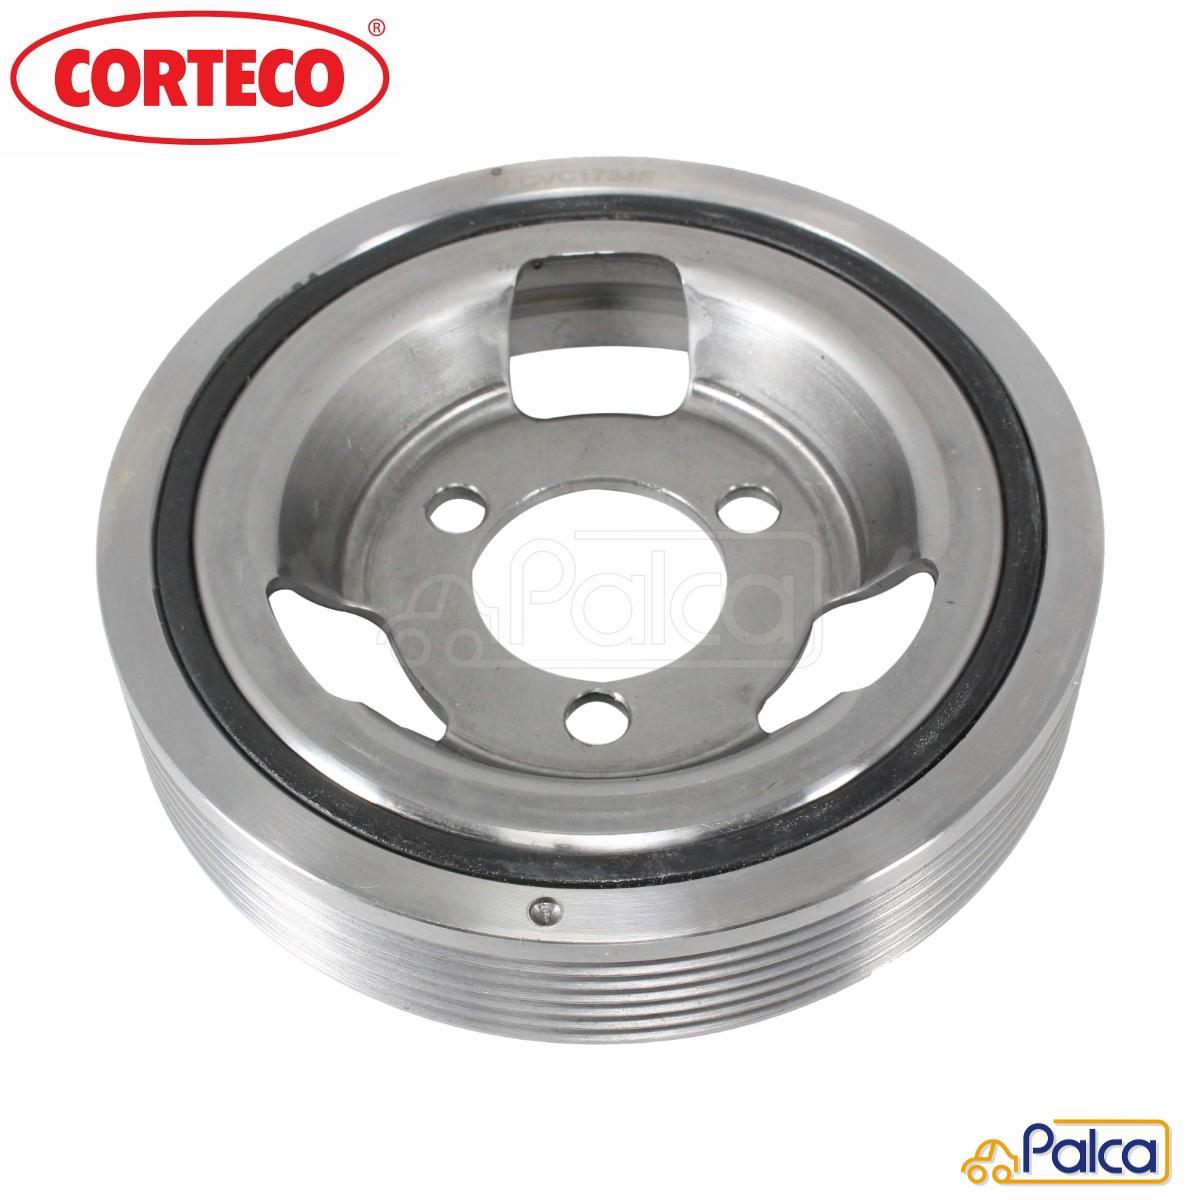 Mini R55 R56 R57 R58 R59 R60 R61 1.4 1.6 One Cooper S JCW Rear Crank Seal